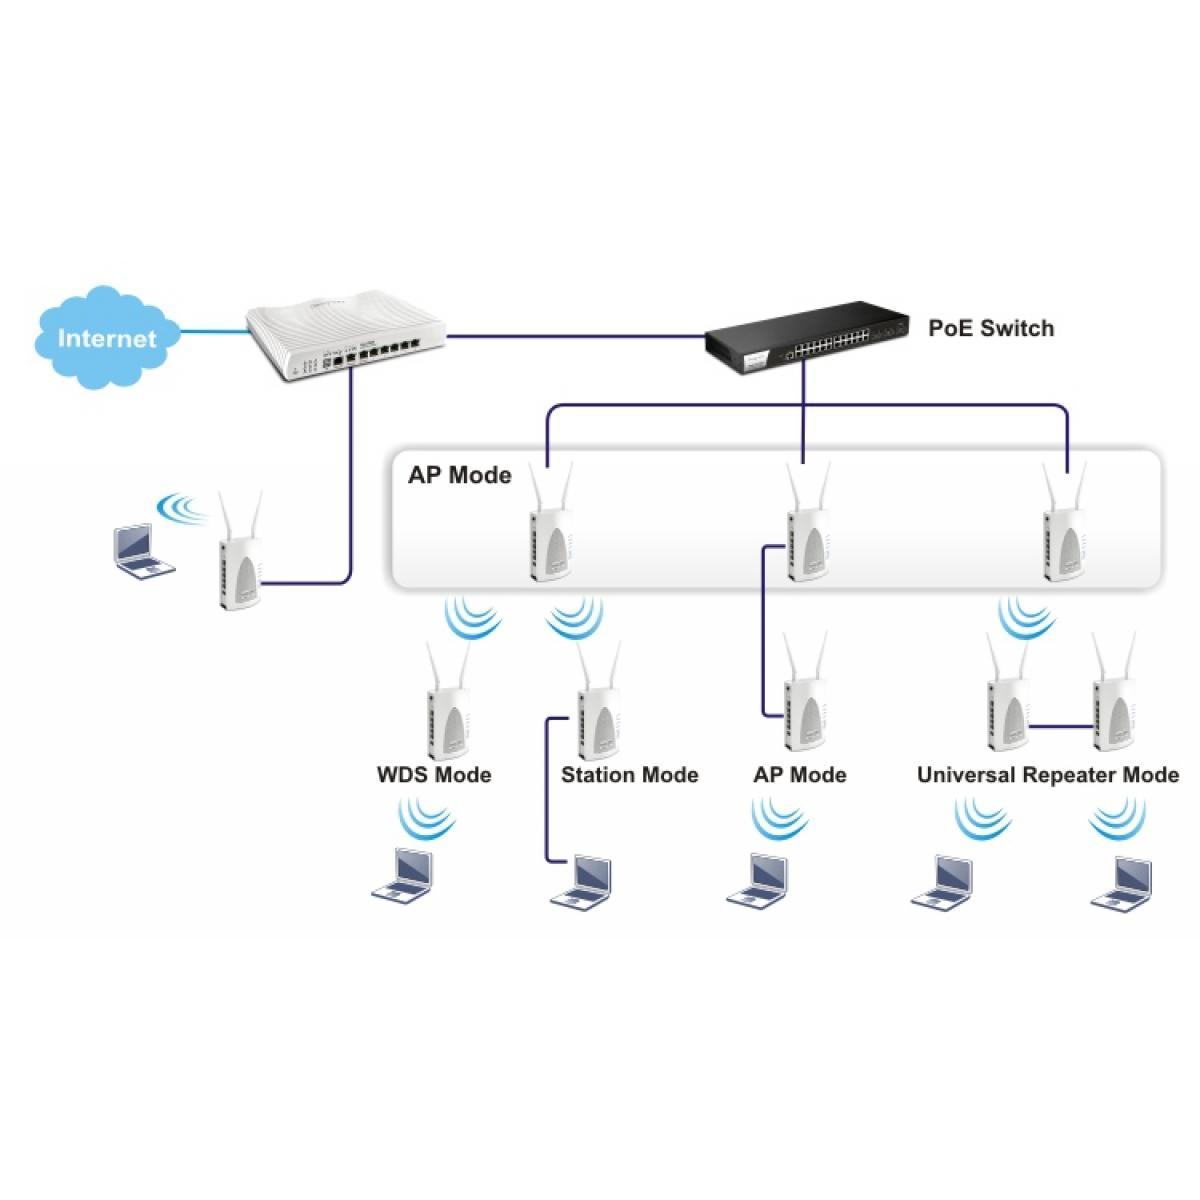 DrayTek VigorAP 902 Managed DB WiFi PoE Access Point